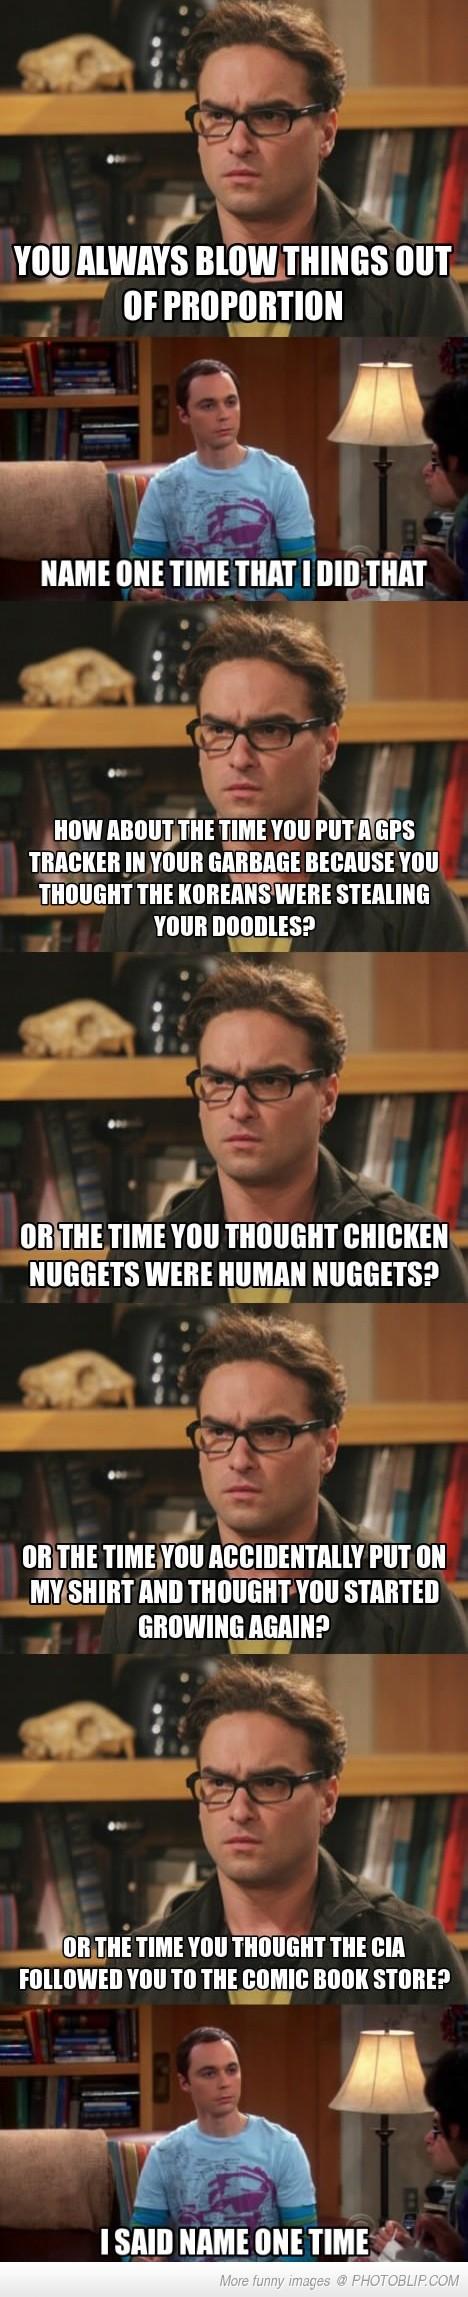 Just Sheldon Overreacting